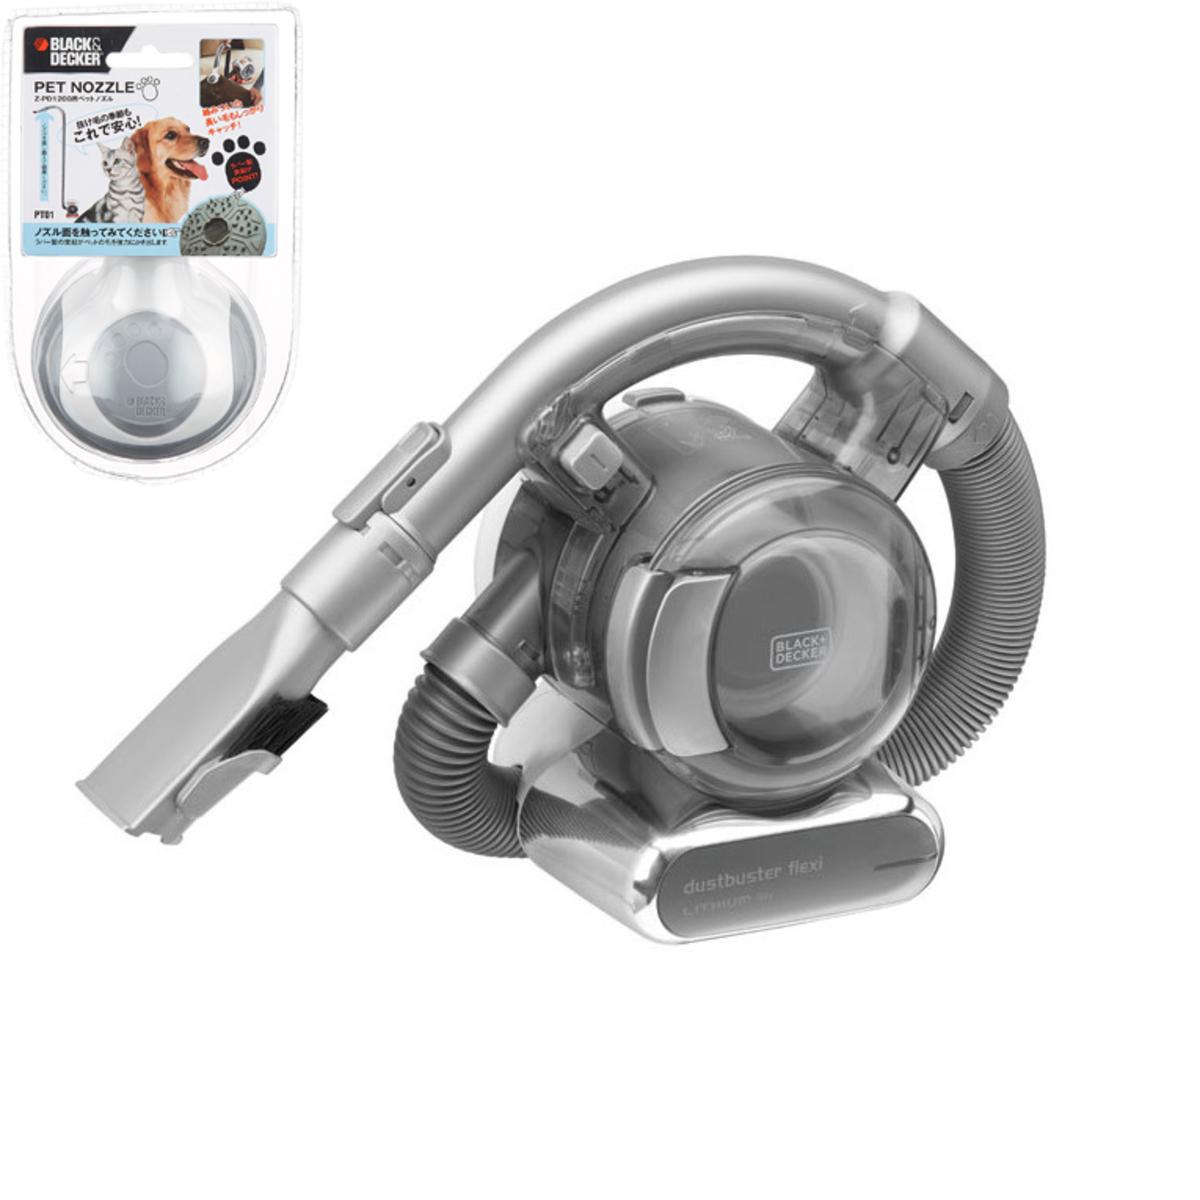 18V小蝸牛無線鋰電吸塵機連寵物毛髮專用吸頭套裝